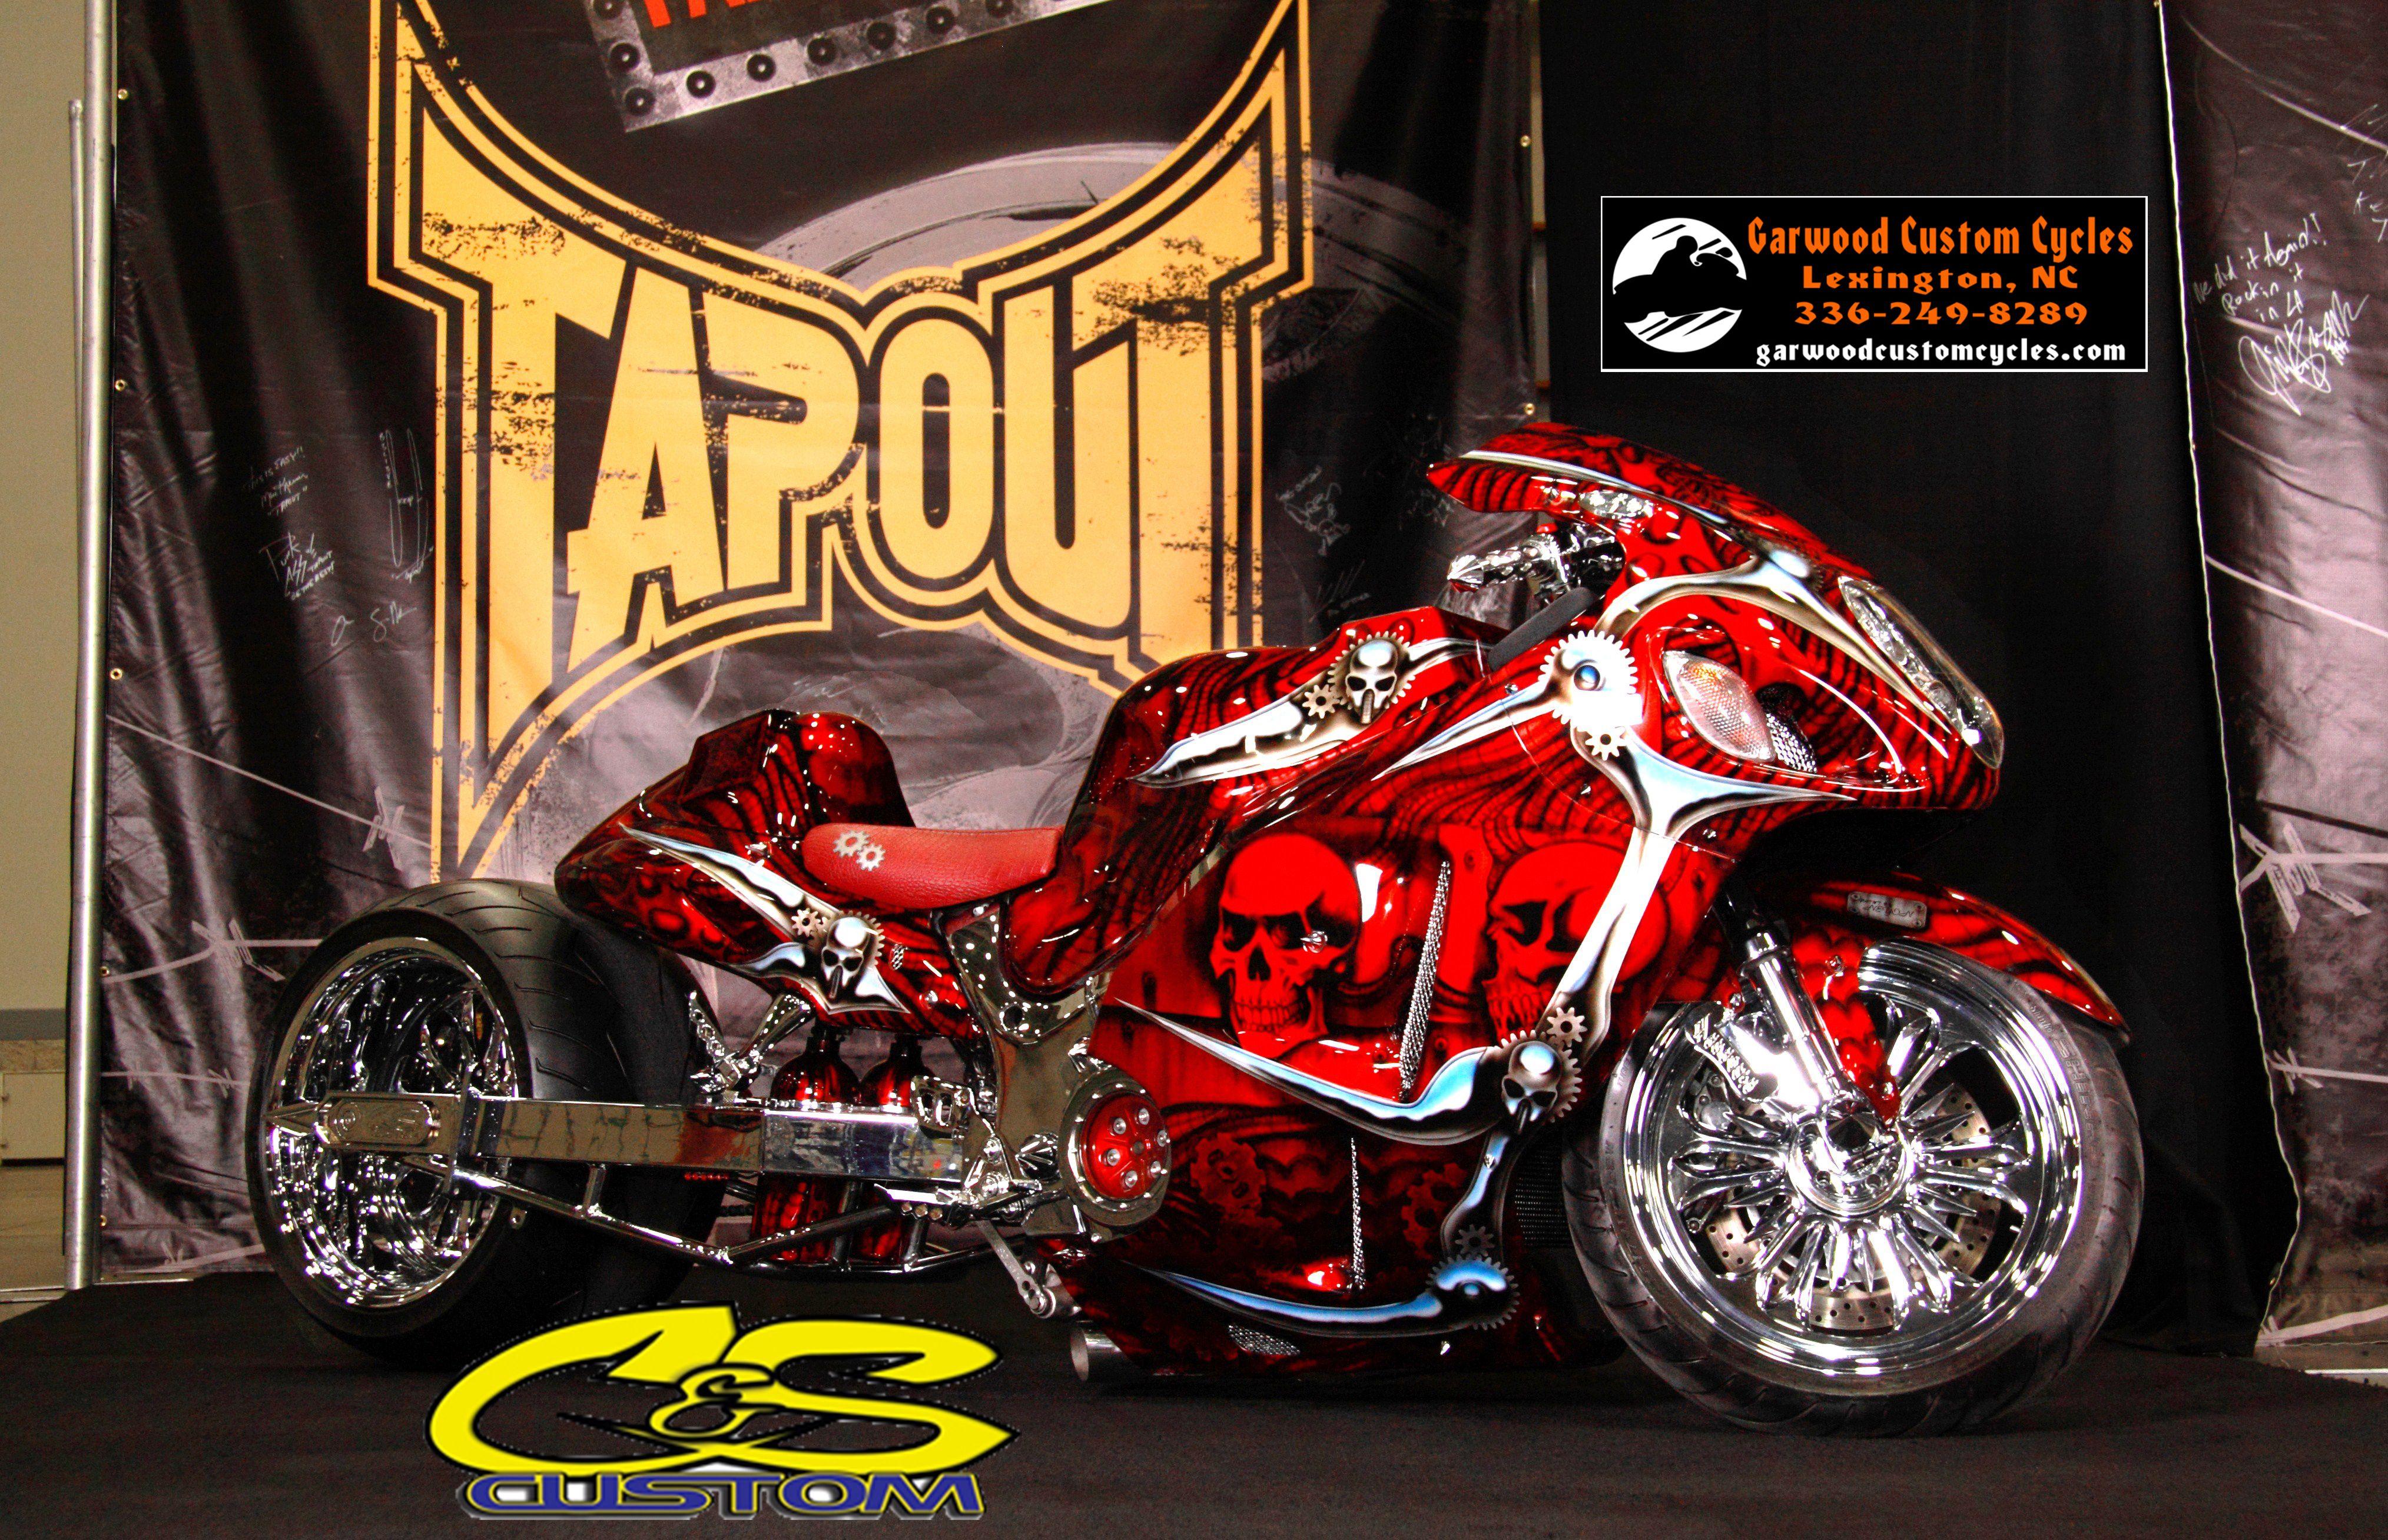 Hotwire by Garwood custom cycles #GCC #Sportbike #Motorcycle #Motorbike  #Kawasaki #zx14 #Suzuki #green #Hayabusa #busa